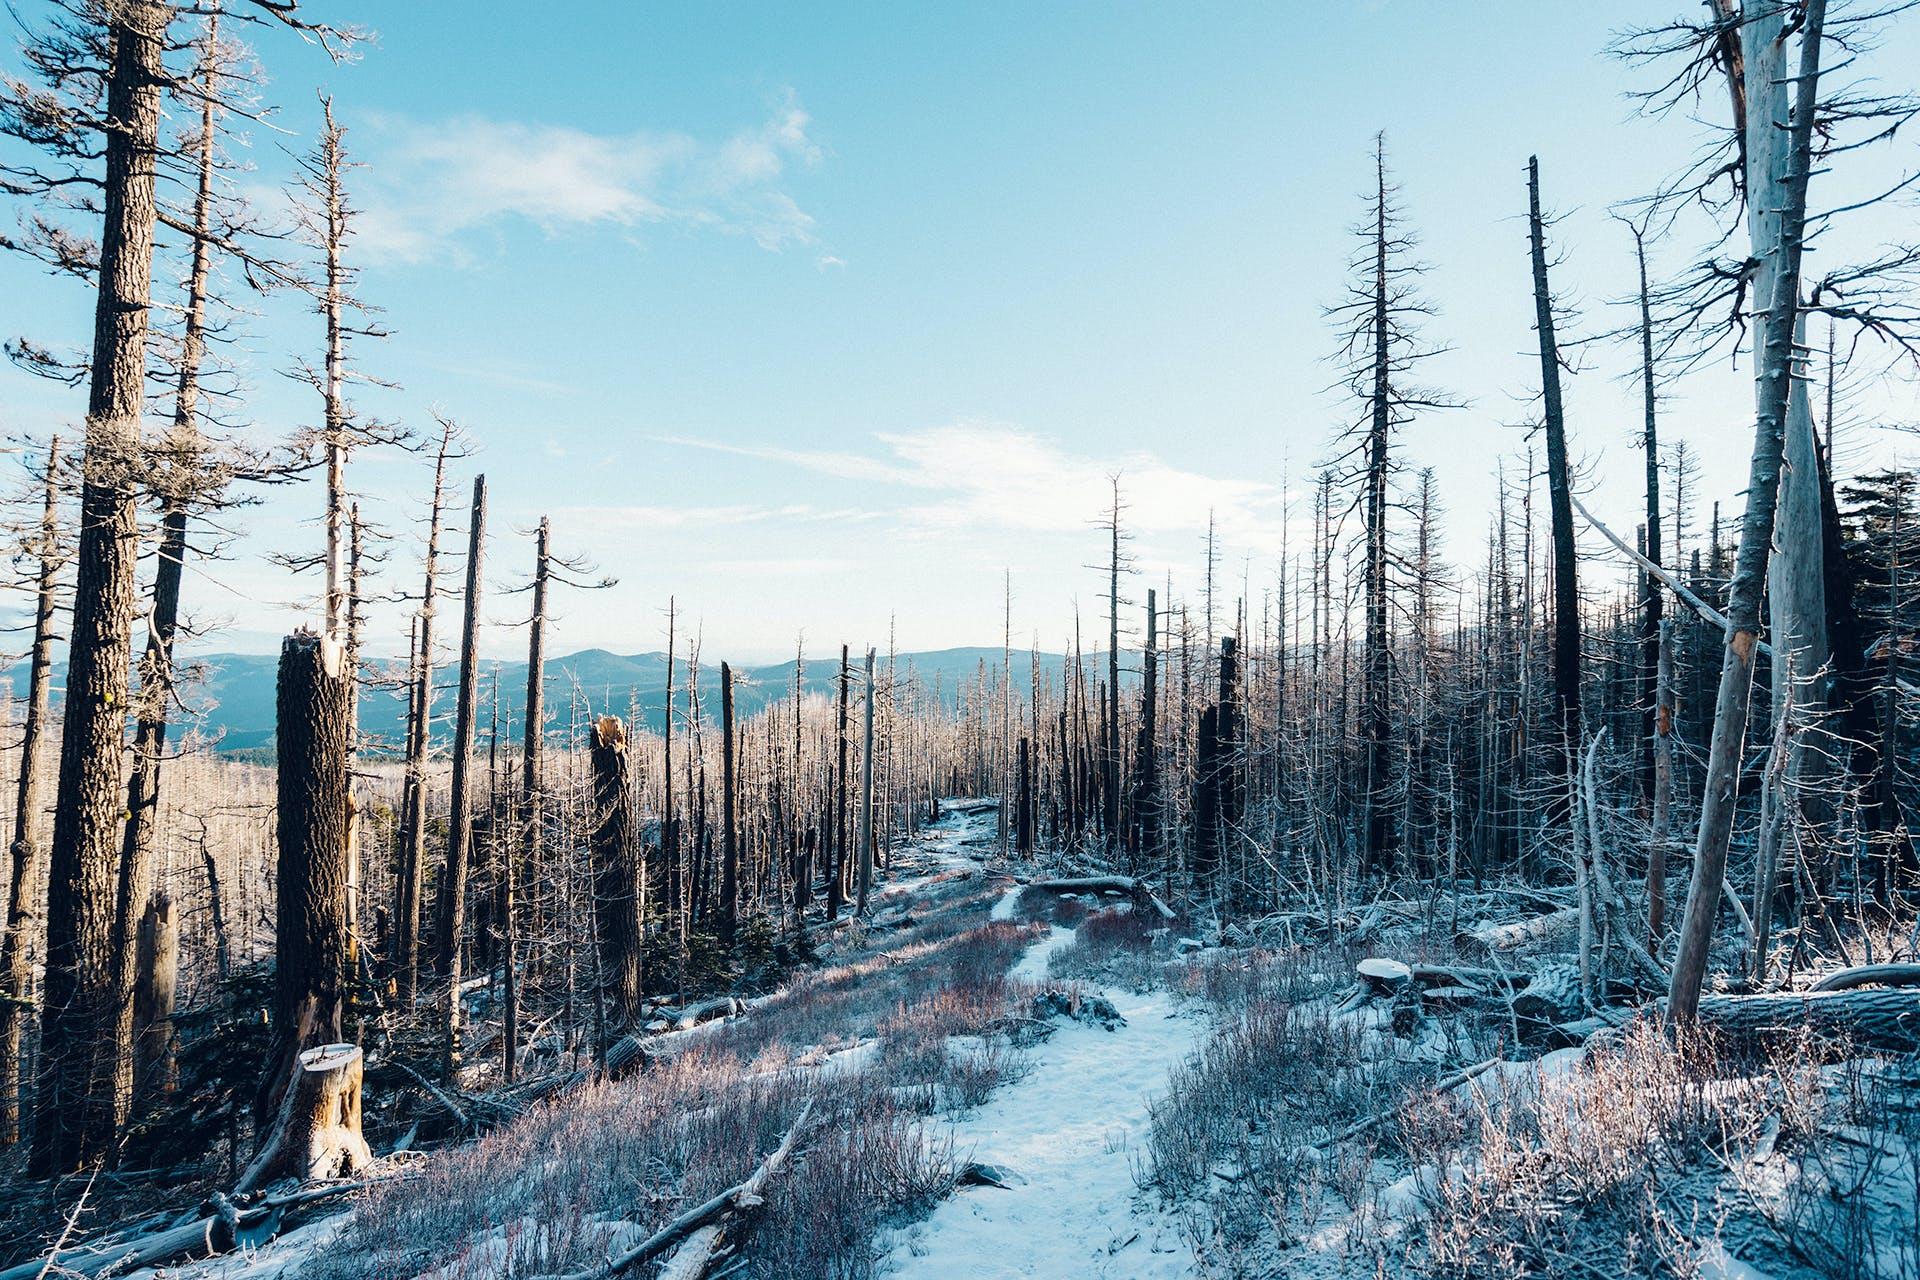 Gratis arkivbilde med fallne trær, snø, vinter